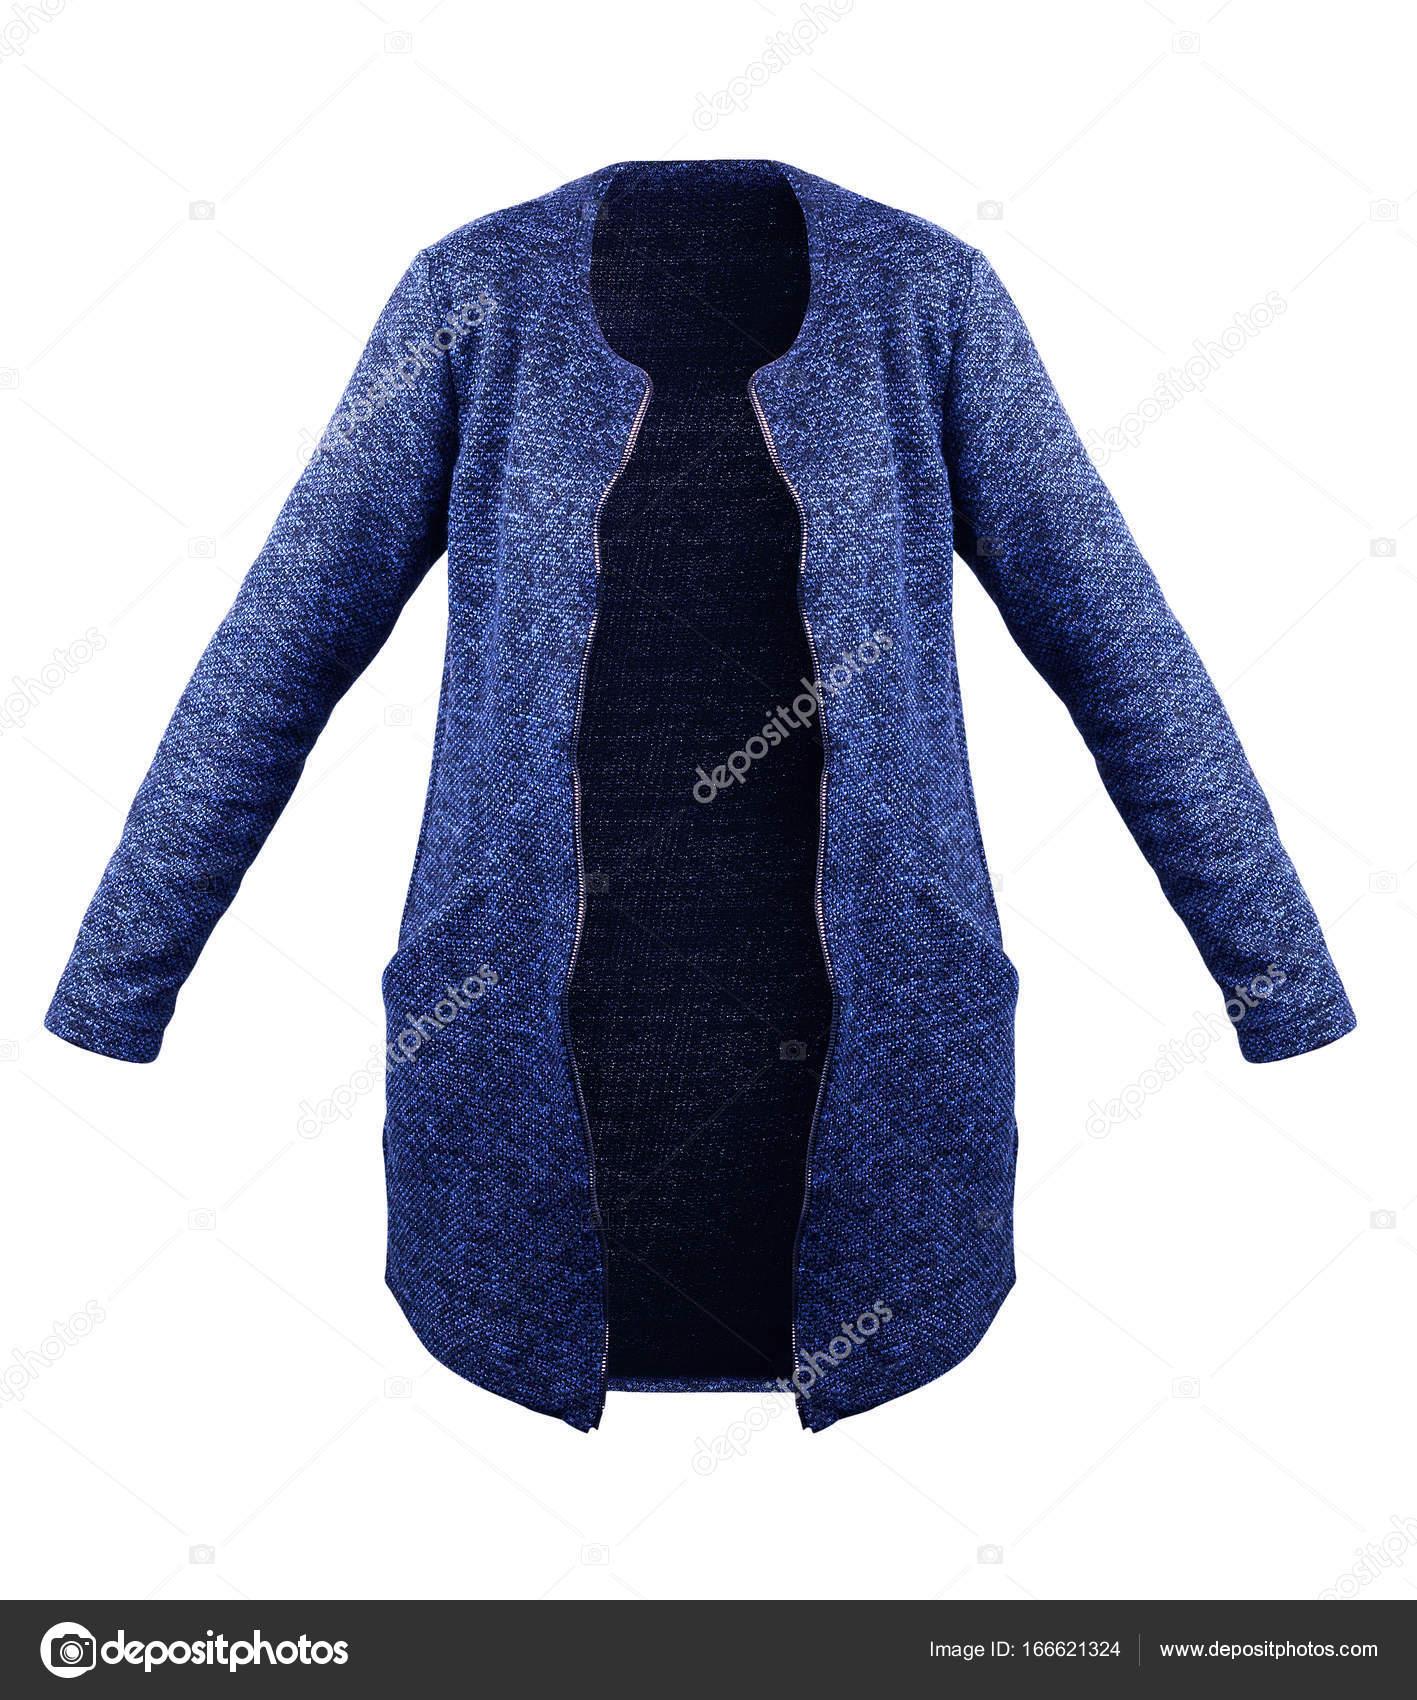 63fd50d0dace Κομψό μπλε μάλλινο παλτό απομονωθεί σε λευκό — Φωτογραφία Αρχείου ...